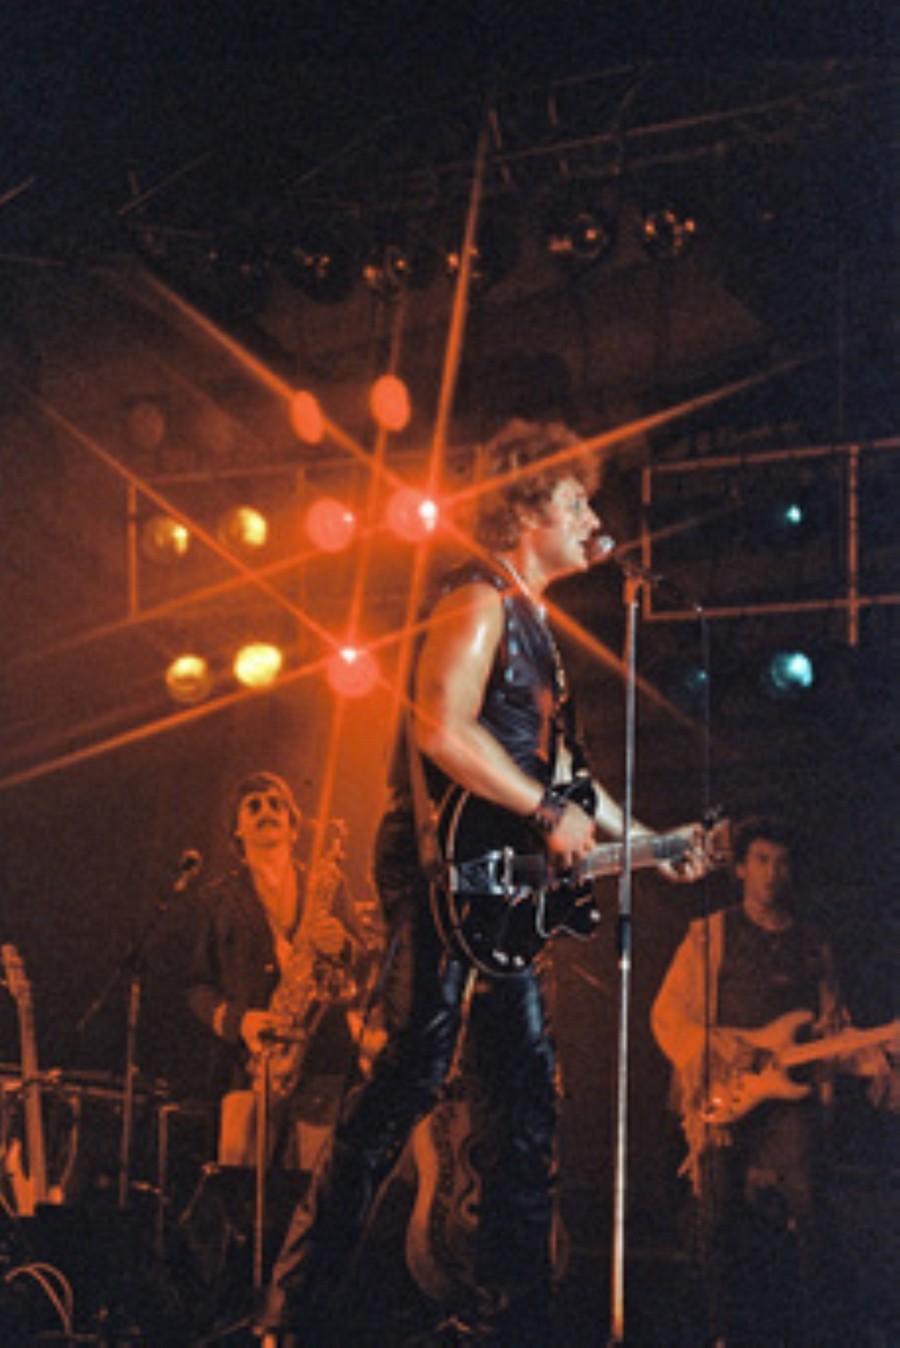 LES CONCERTS DE JOHNNY 'NANCY 1983' Akg77187